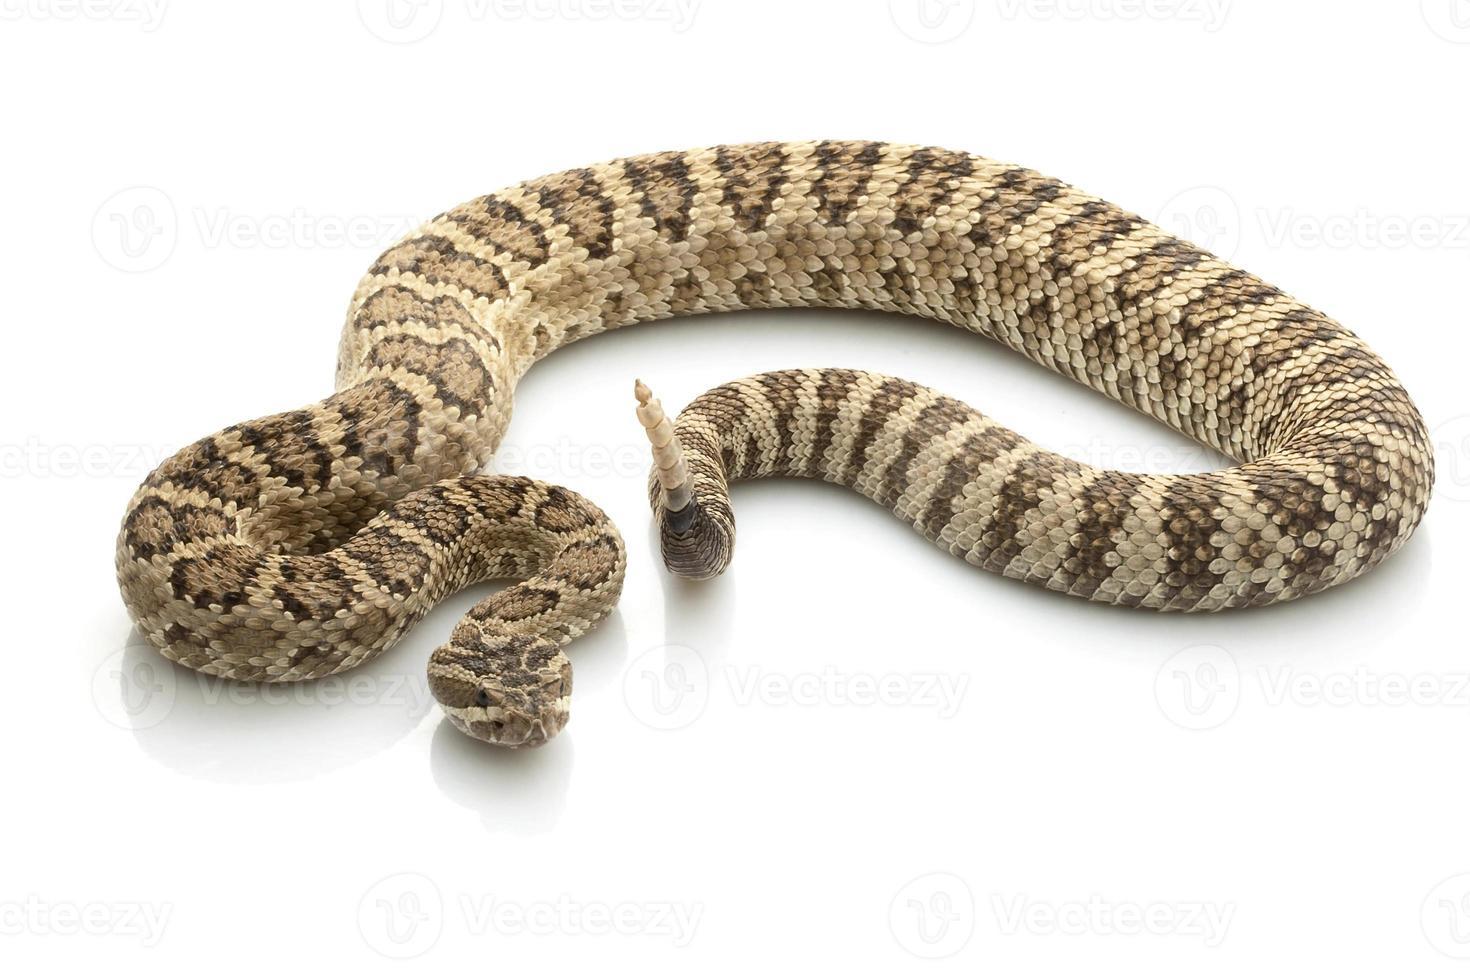 A scary Great Basin Rattlesnake photo